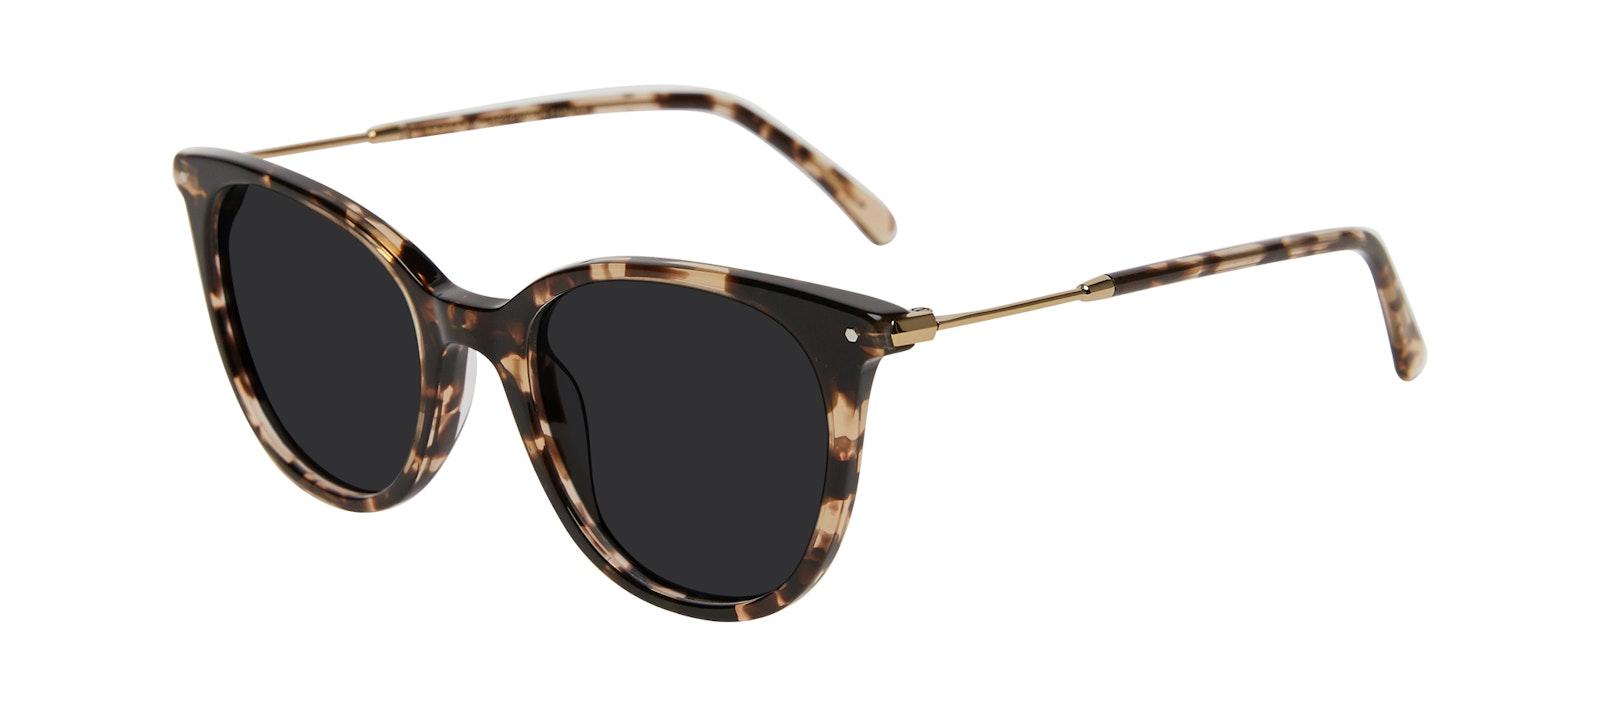 Affordable Fashion Glasses Square Sunglasses Women Wordly Leopard Tilt